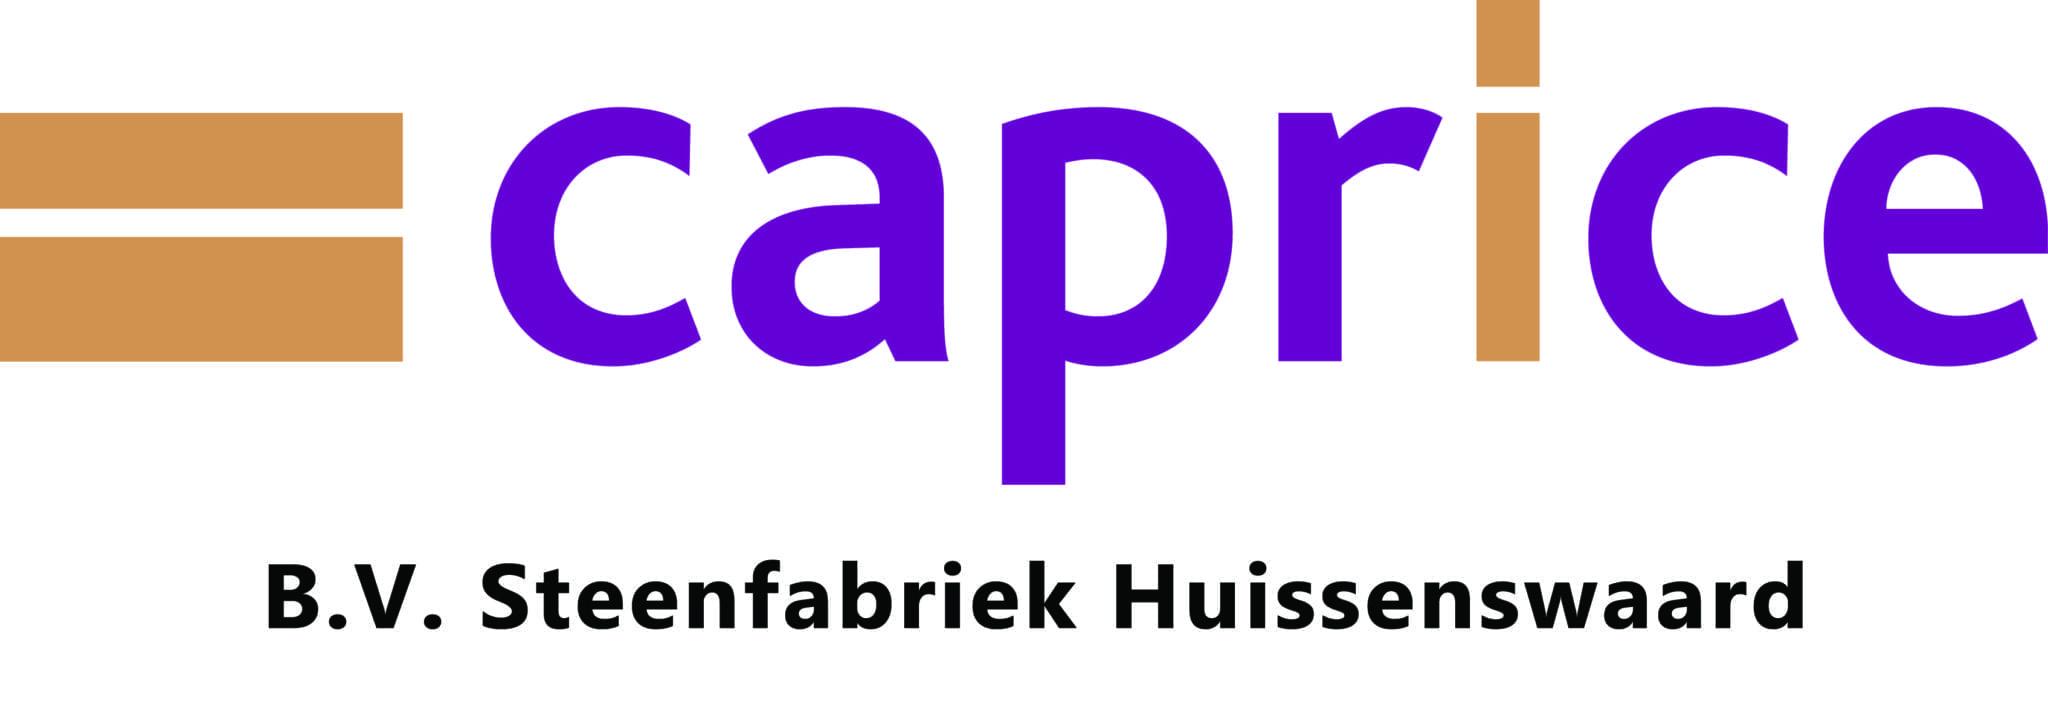 Caprice : Brand Short Description Type Here.